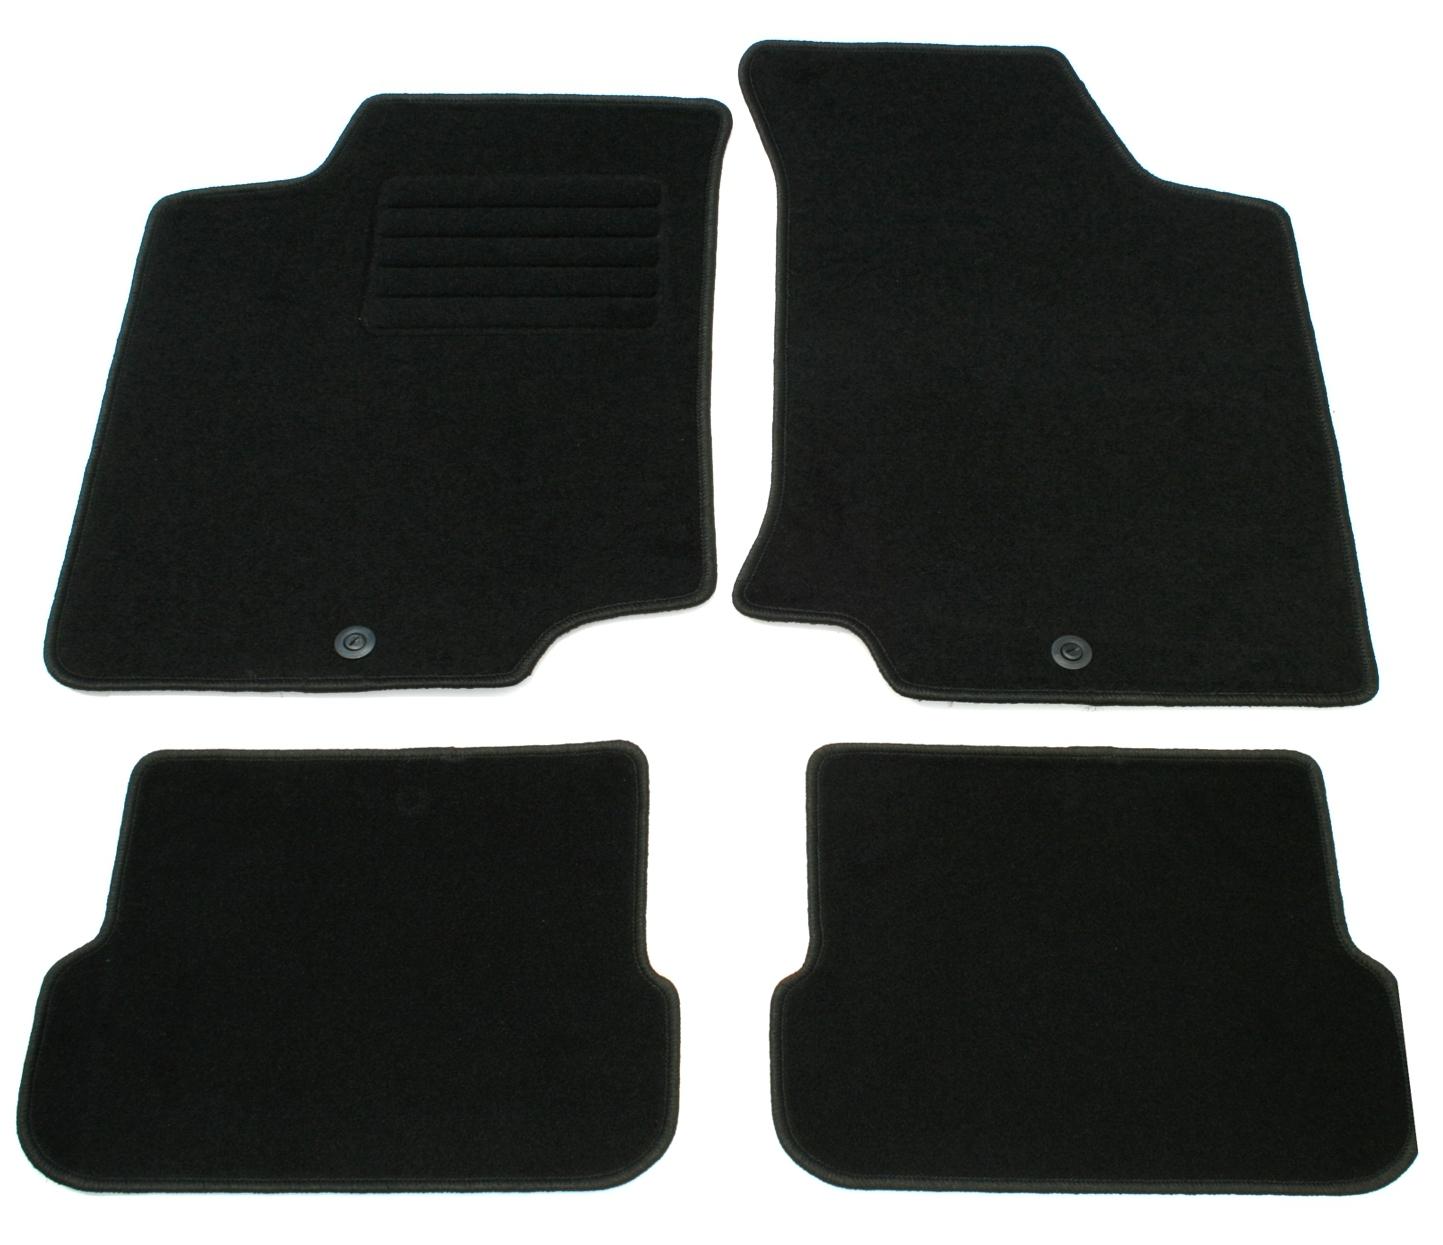 fu matten f r vw golf 3 cabrio 93 98 passform velours. Black Bedroom Furniture Sets. Home Design Ideas